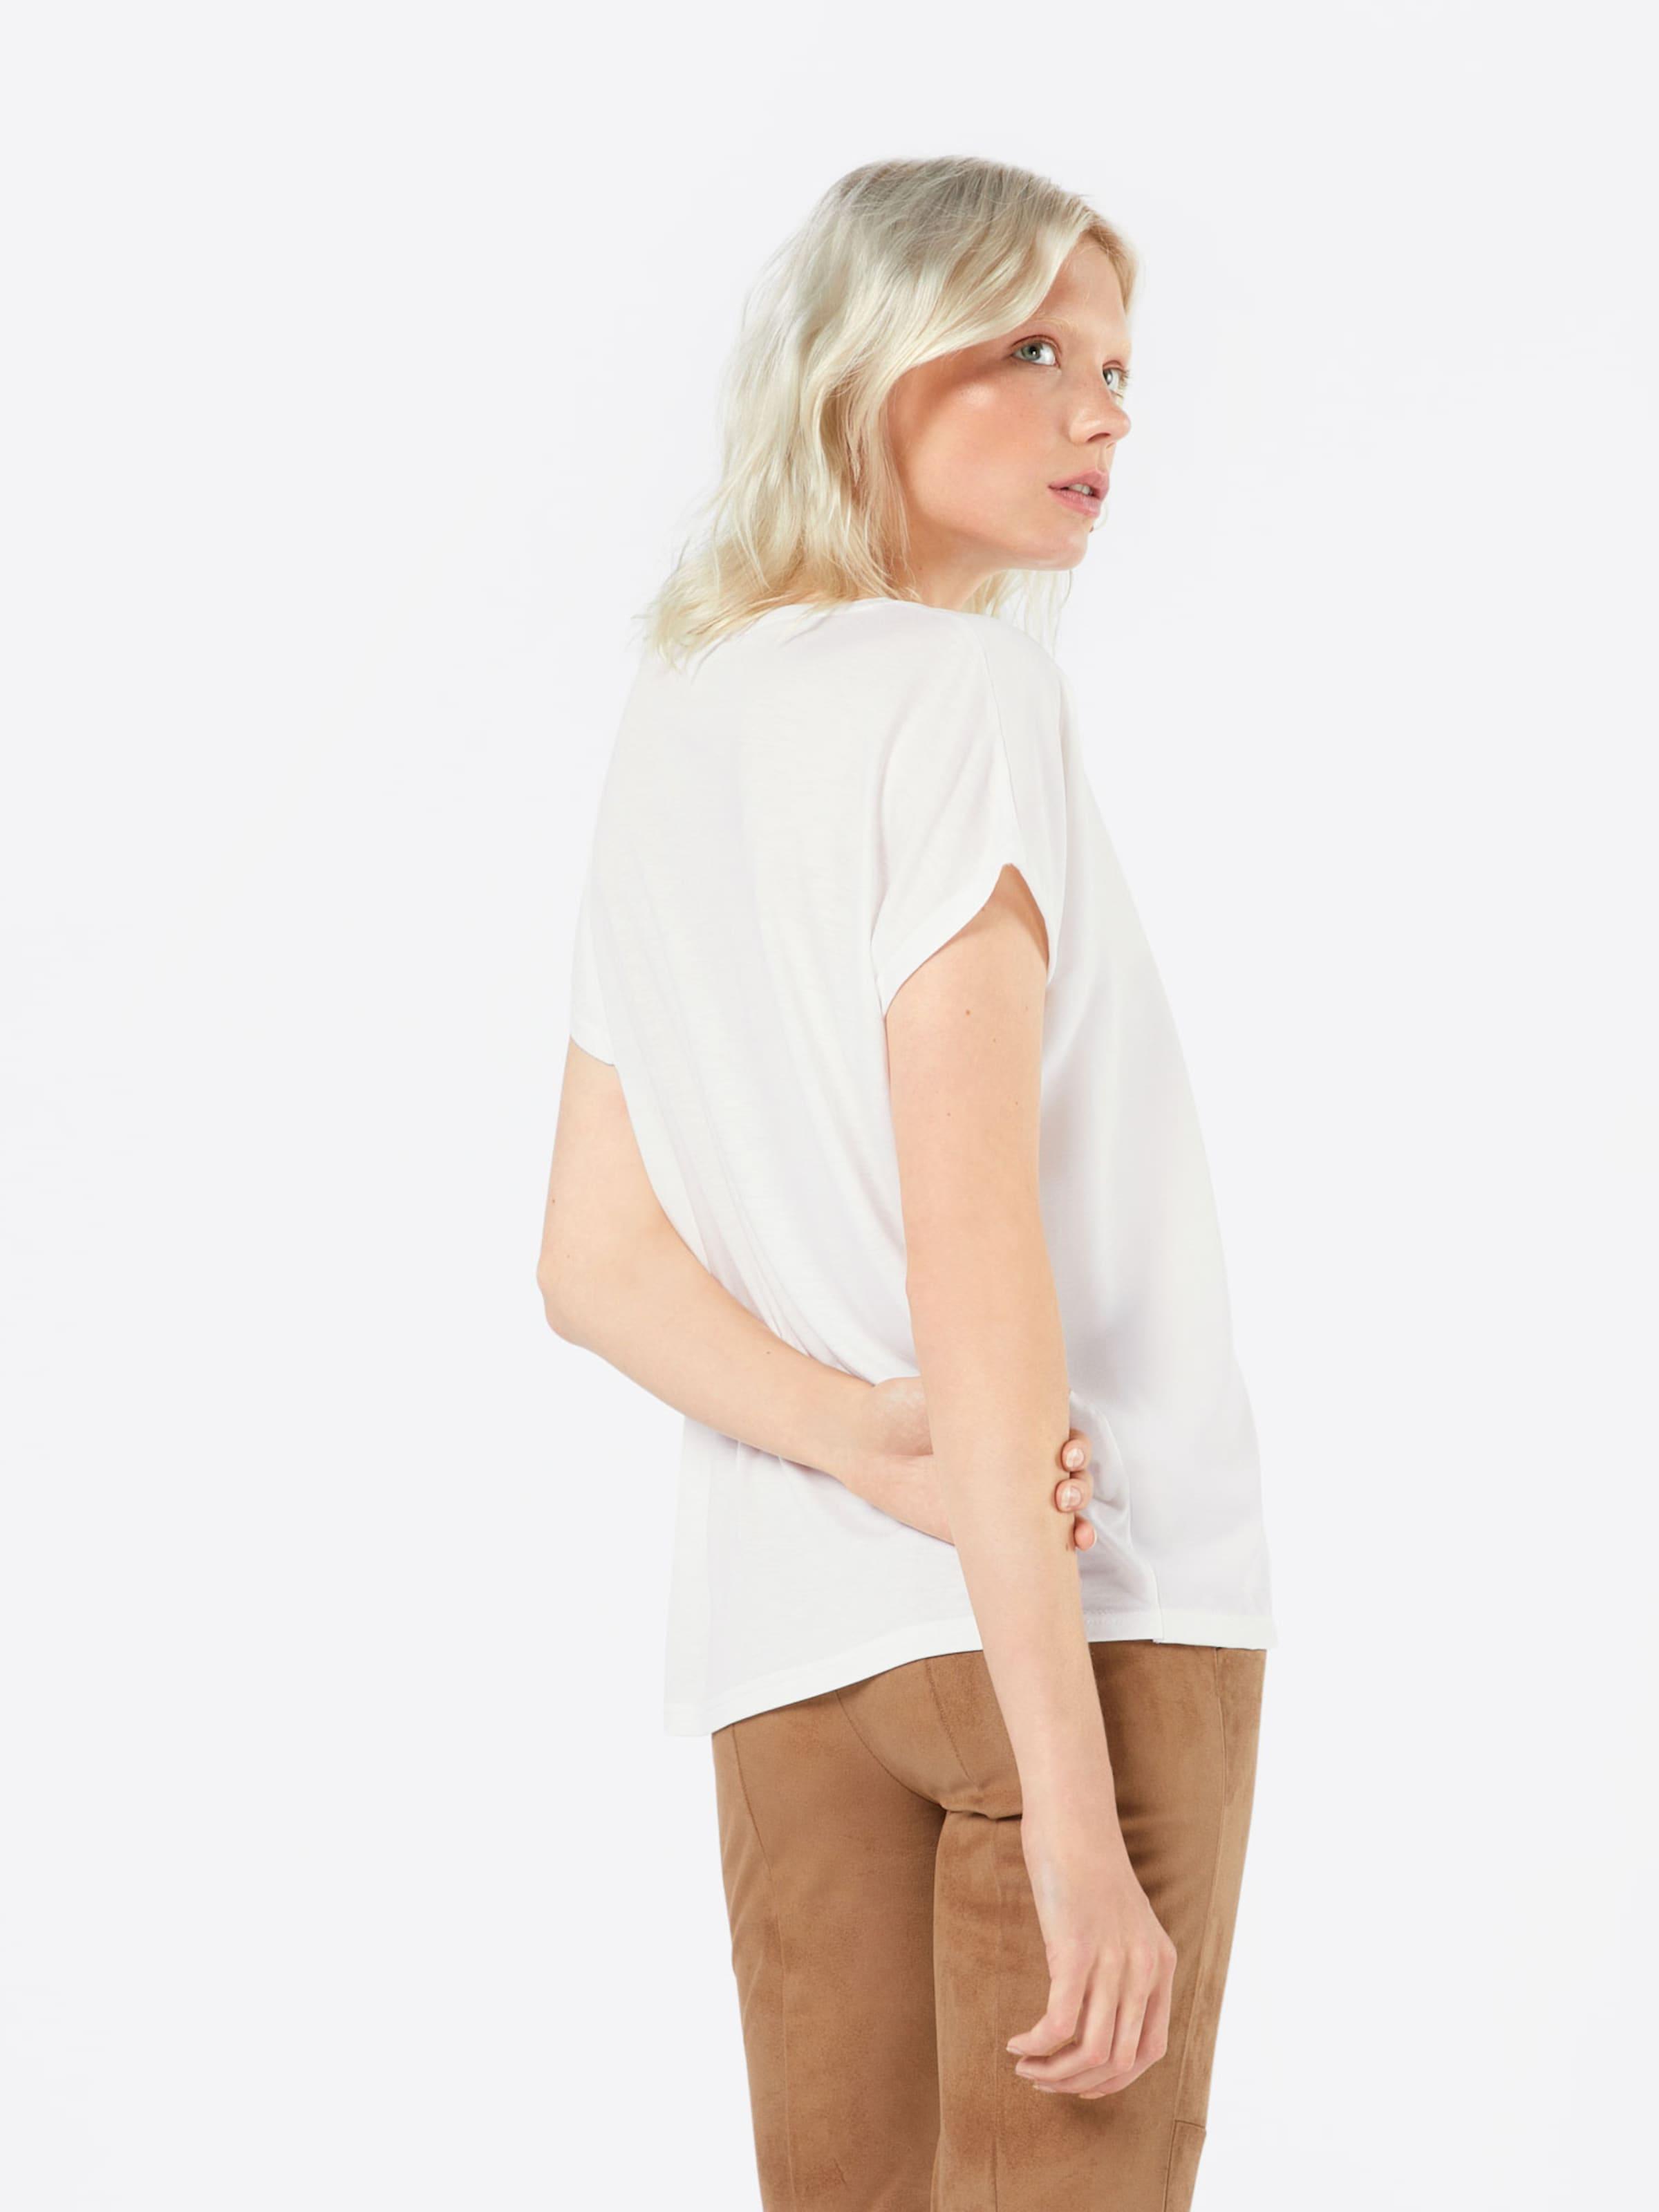 anna & ella Shirt 'Sina' Extrem Günstiger Preis DyaQqC6